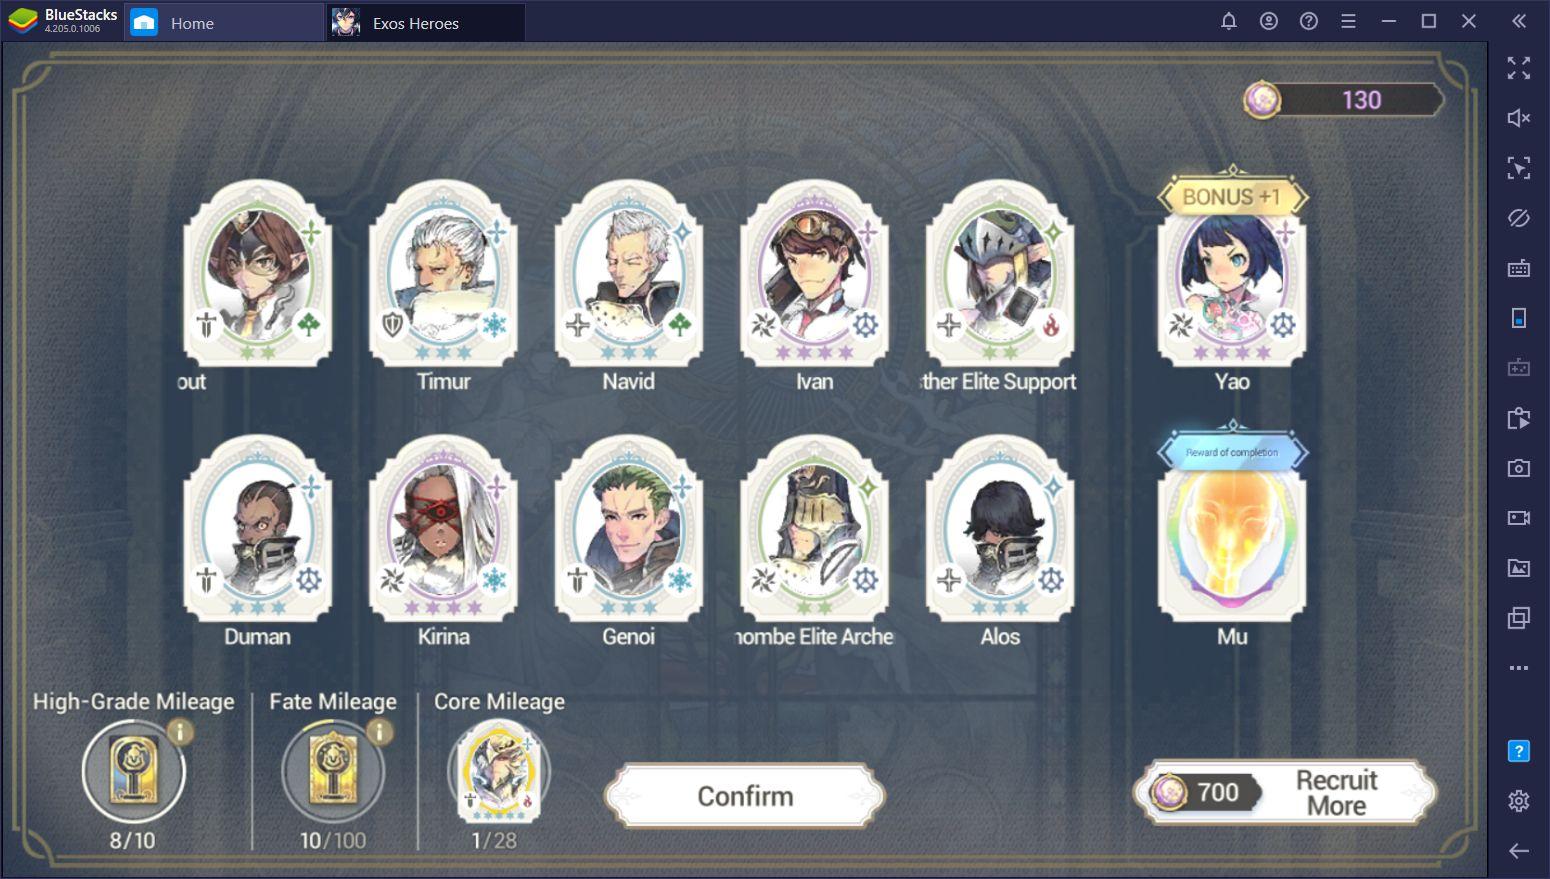 Exos Heroes – Leitfaden zum Rerolling und Rangliste der besten Charaktere